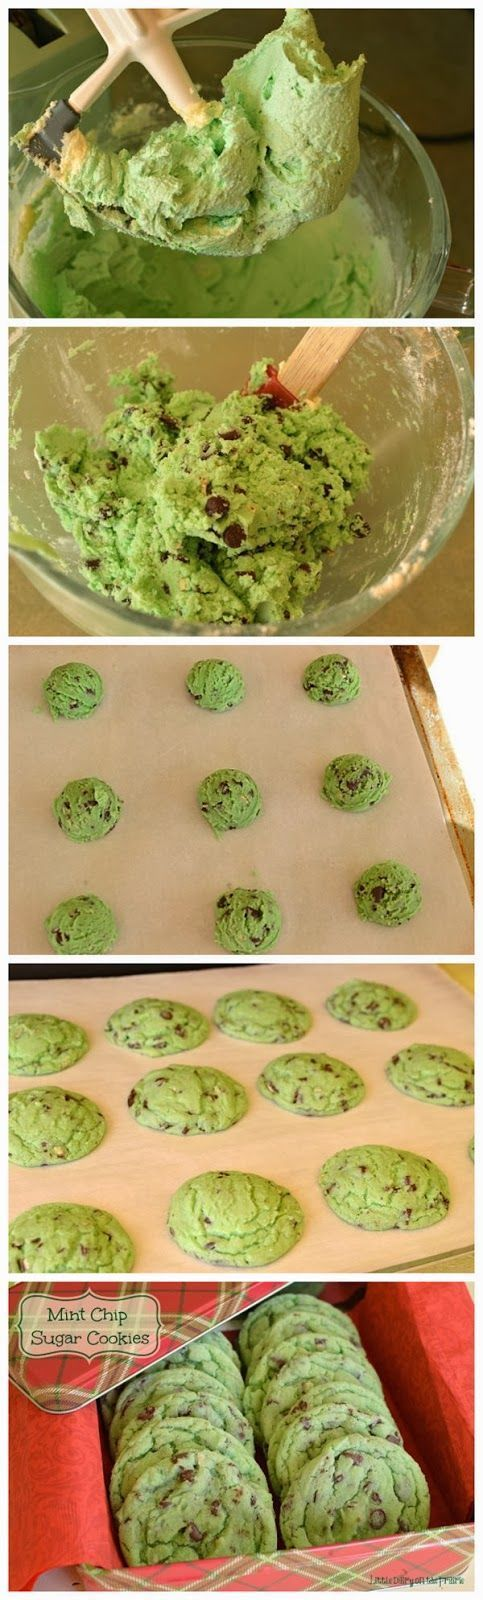 Mint Chip Sugar Cookies Recipe #Yummy @Kelly Teske Goldsworthy Teske Goldsworthy Teske Goldsworthy Walden look!